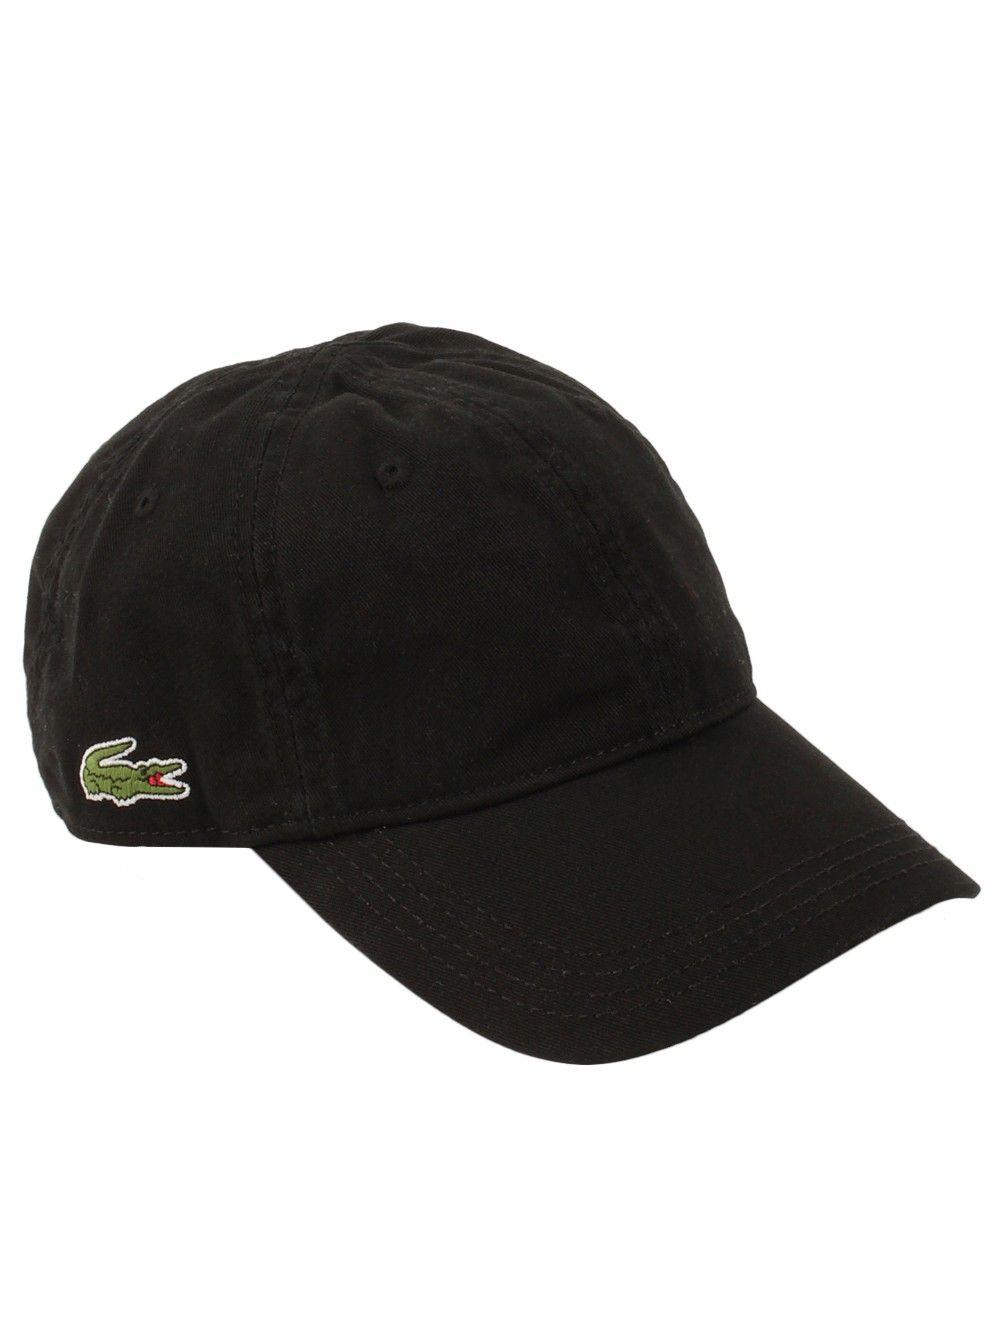 1279cfb05 Lacoste® Men s Cap in Black